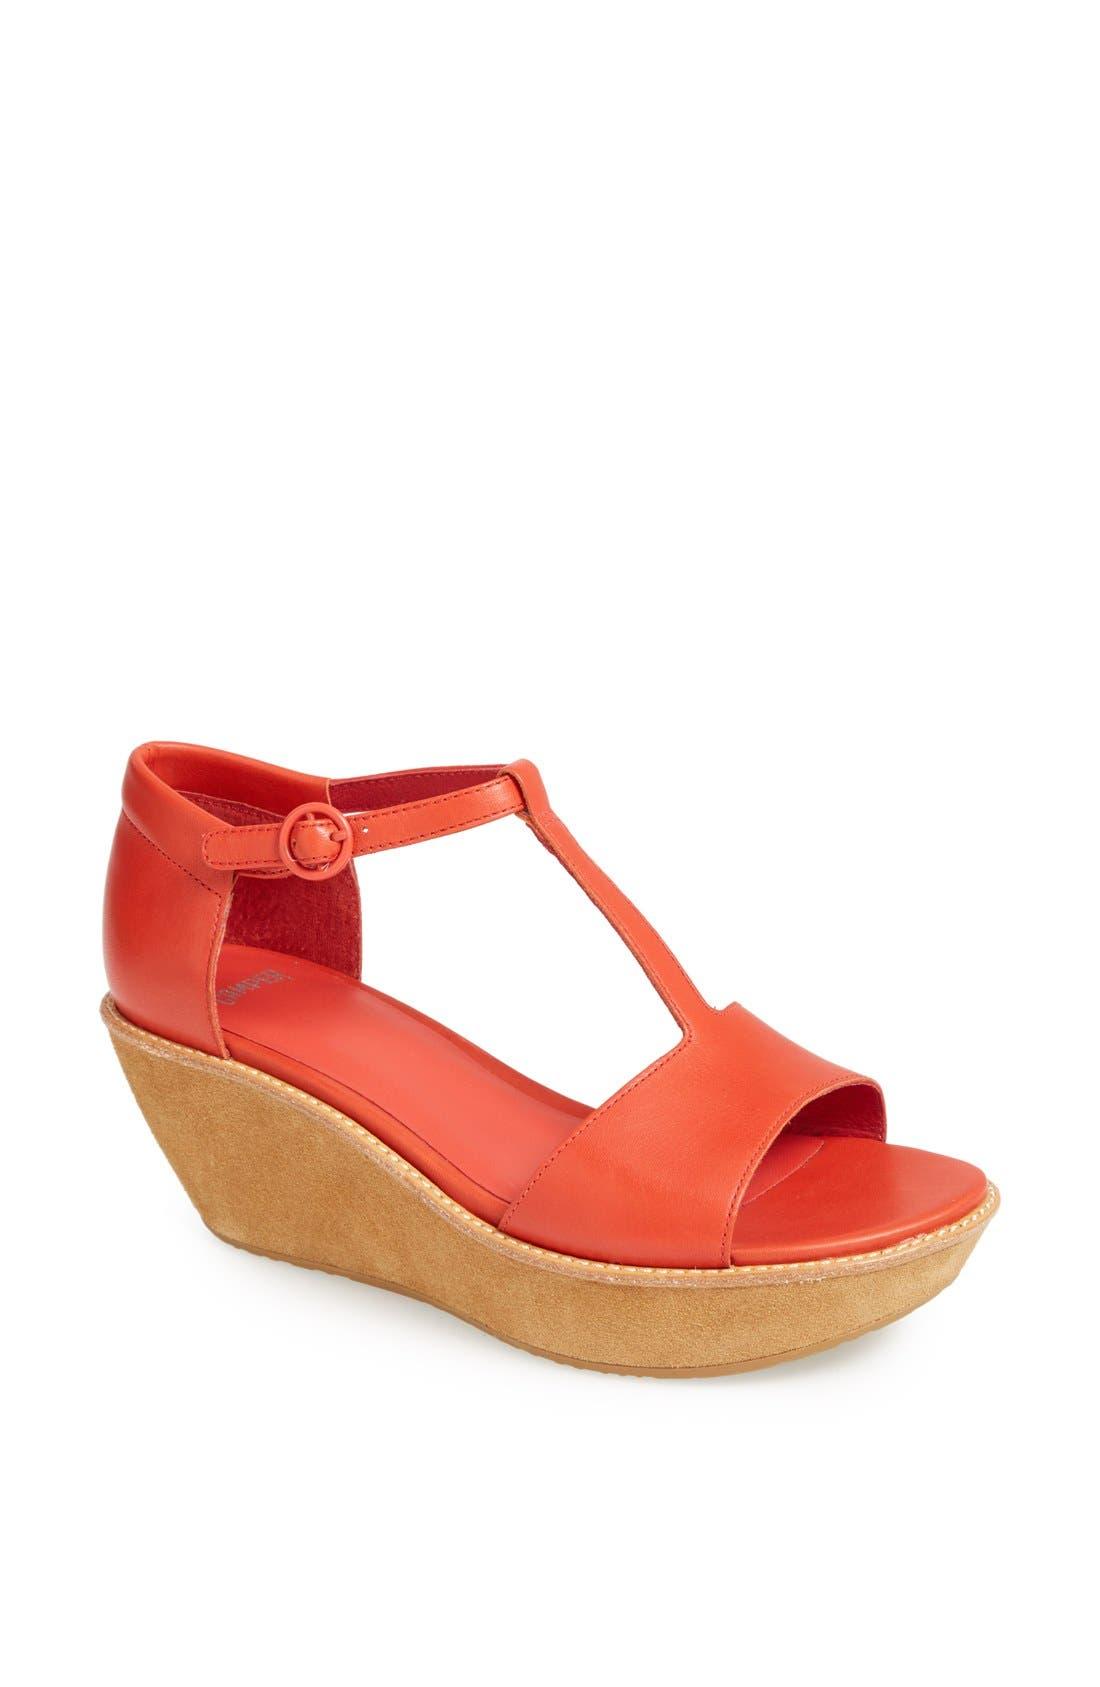 Main Image - Camper 'Damas' T-Strap Wedge Sandal